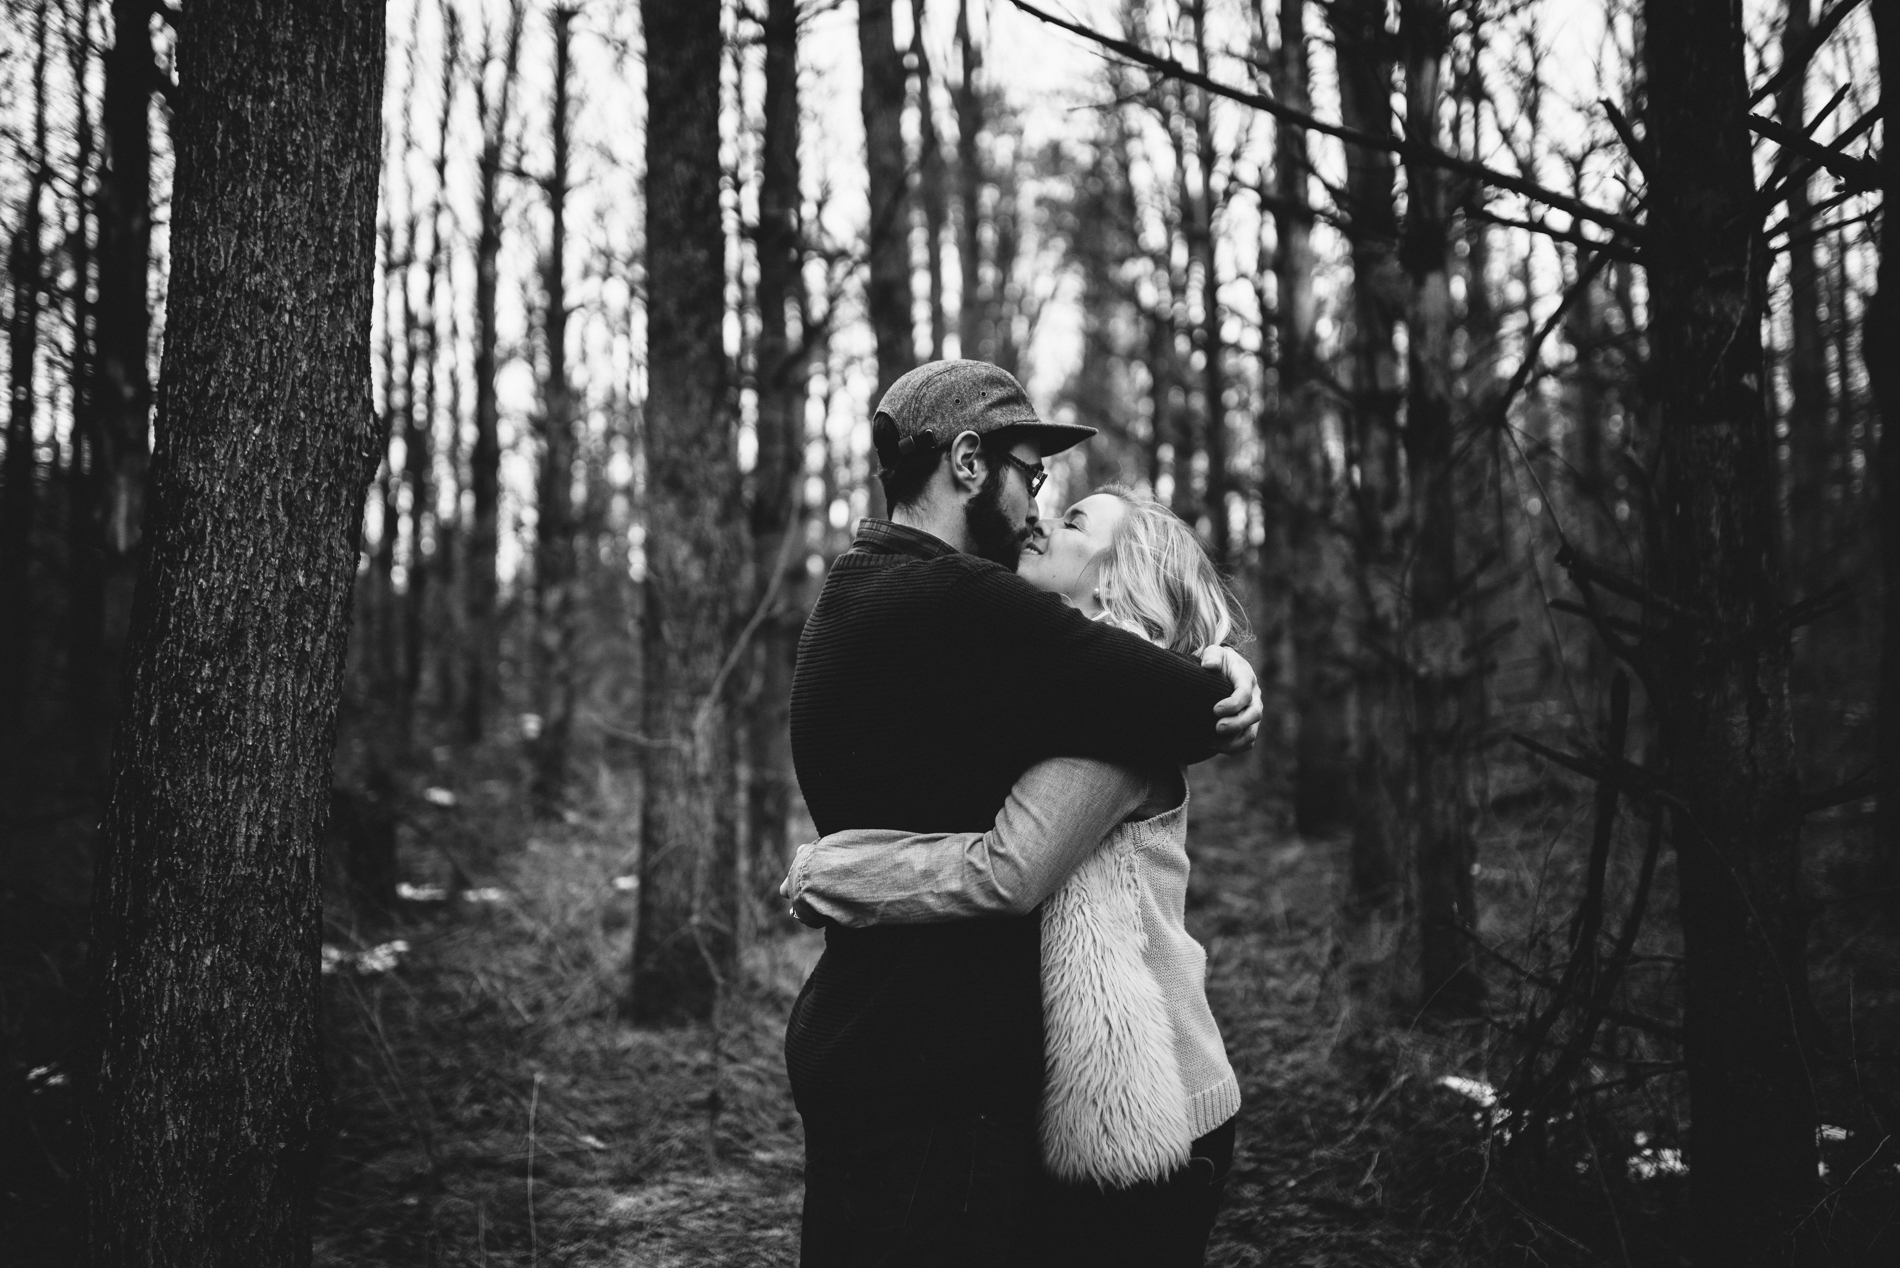 Winter-Forest-Engagement-Shoot-28